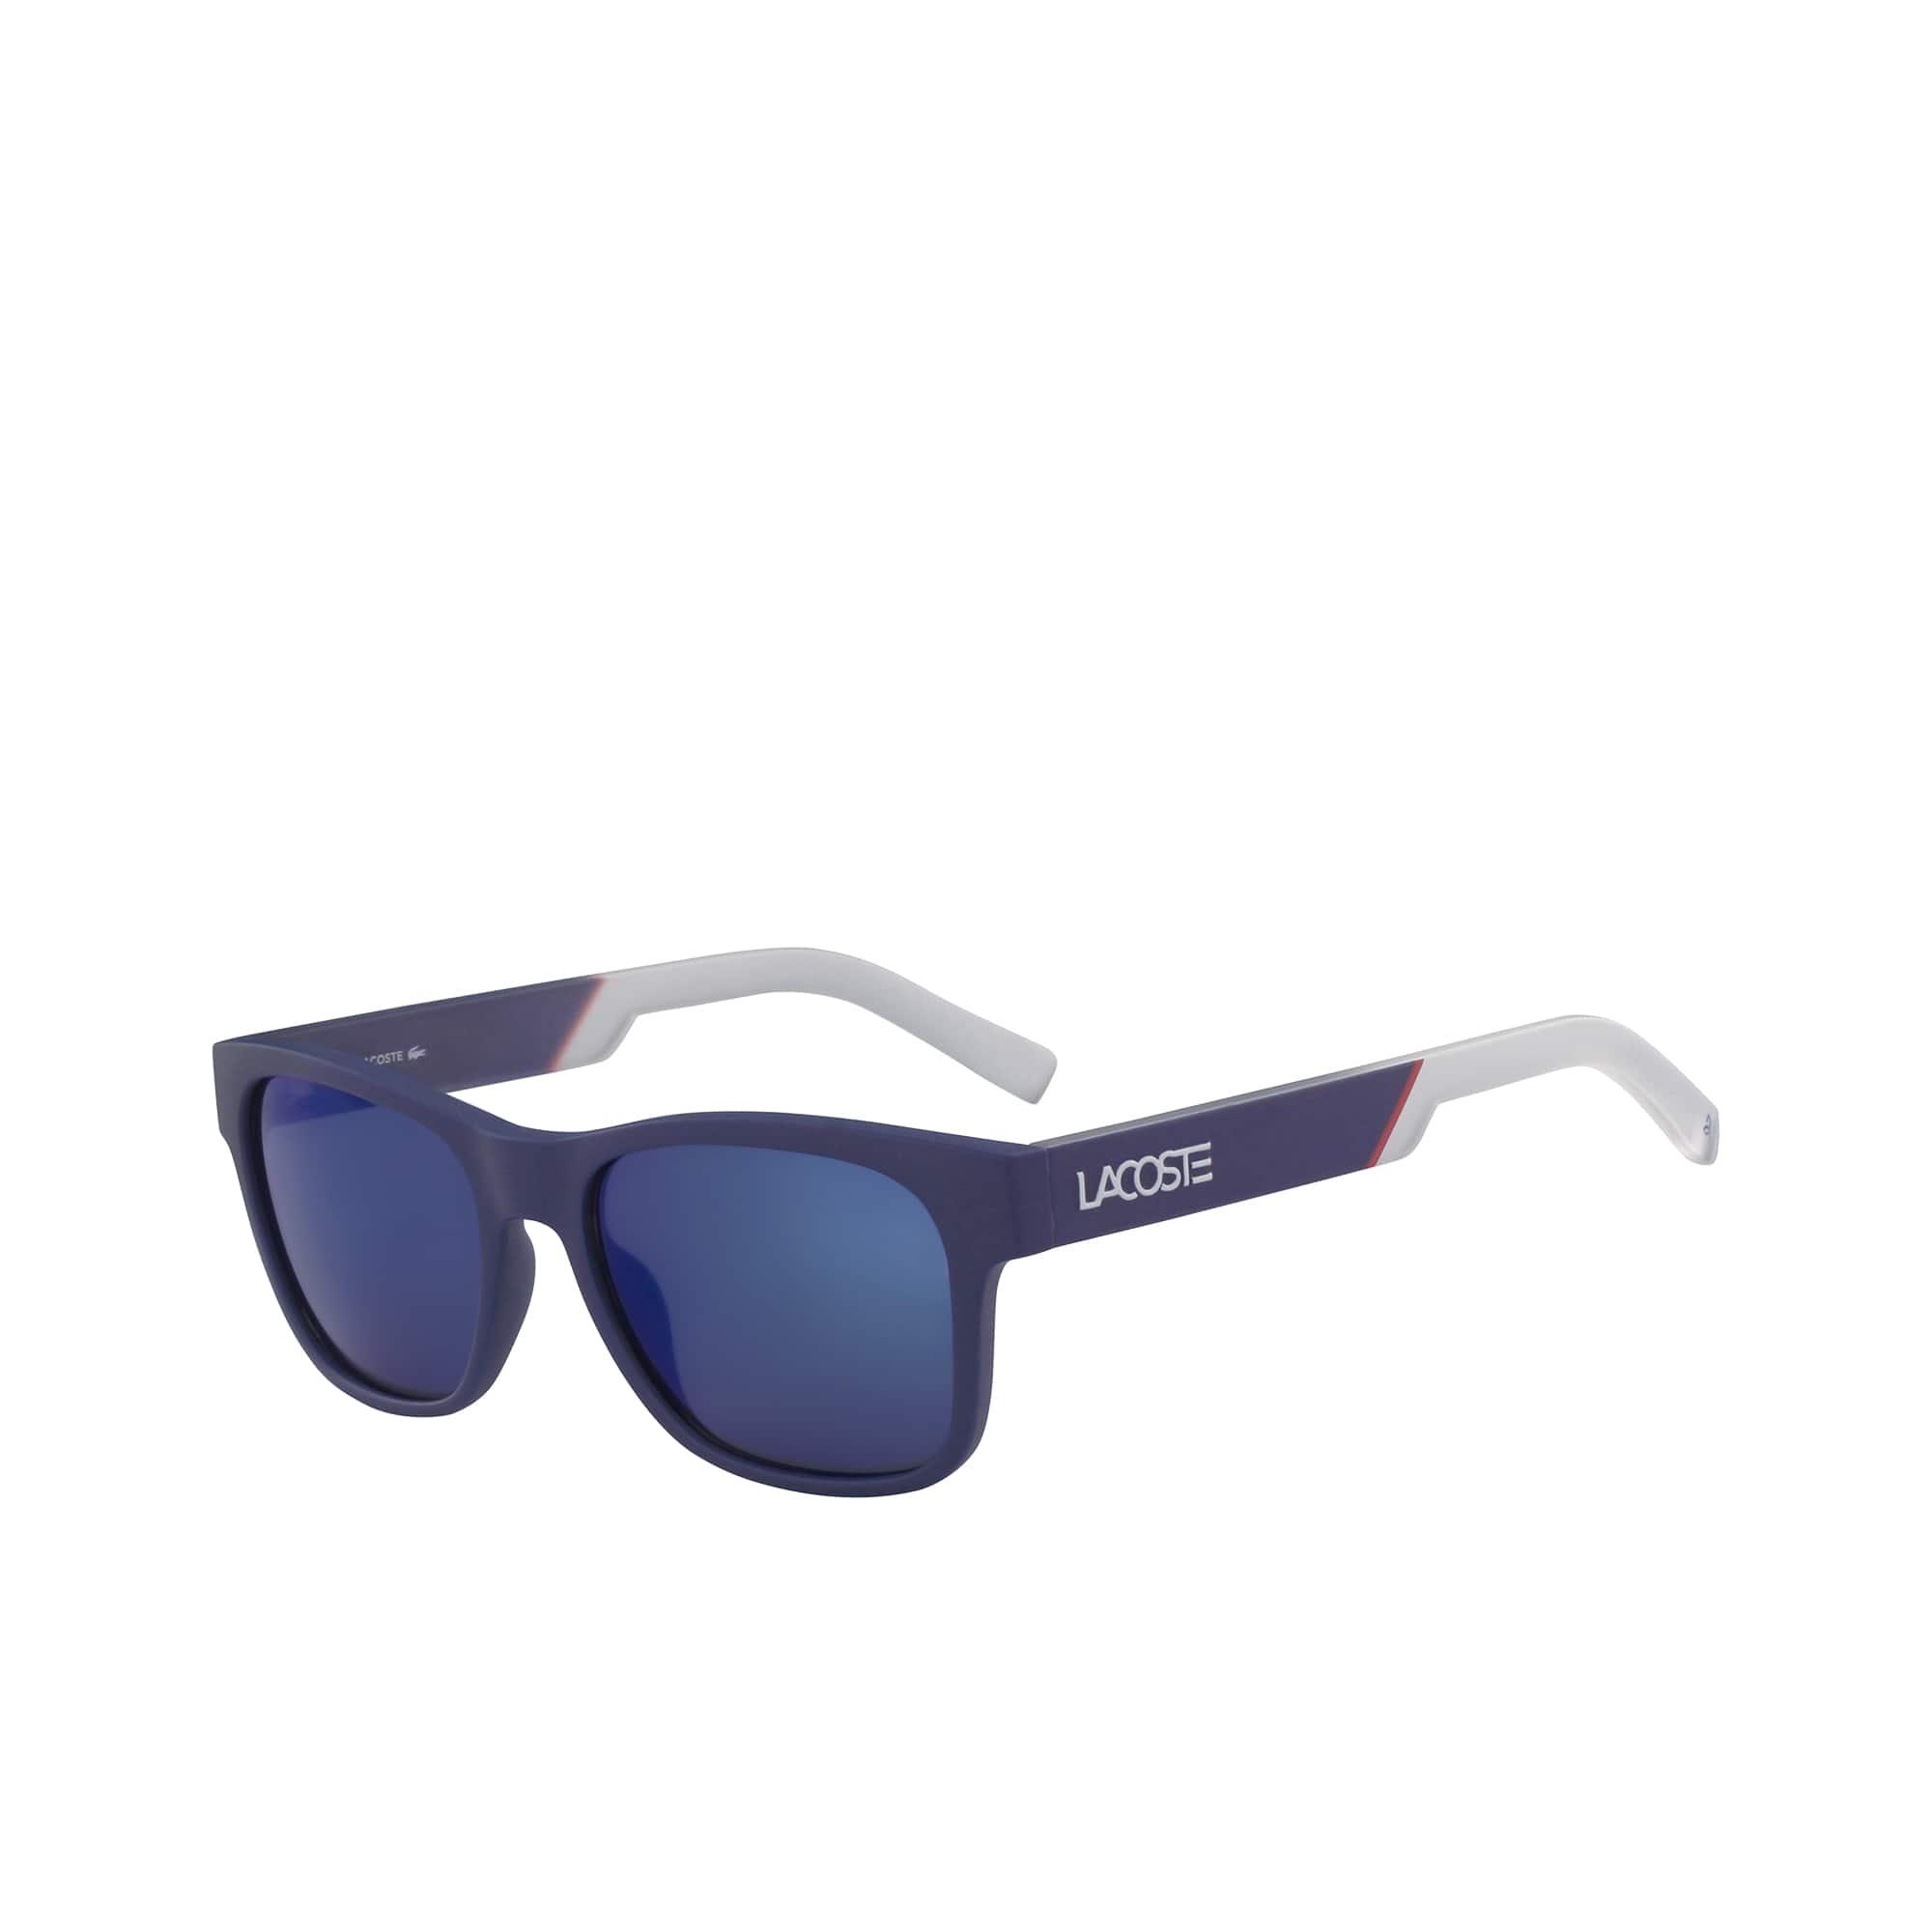 Fan Sunglasses in Injected Plastic Novak Djokovic Edition